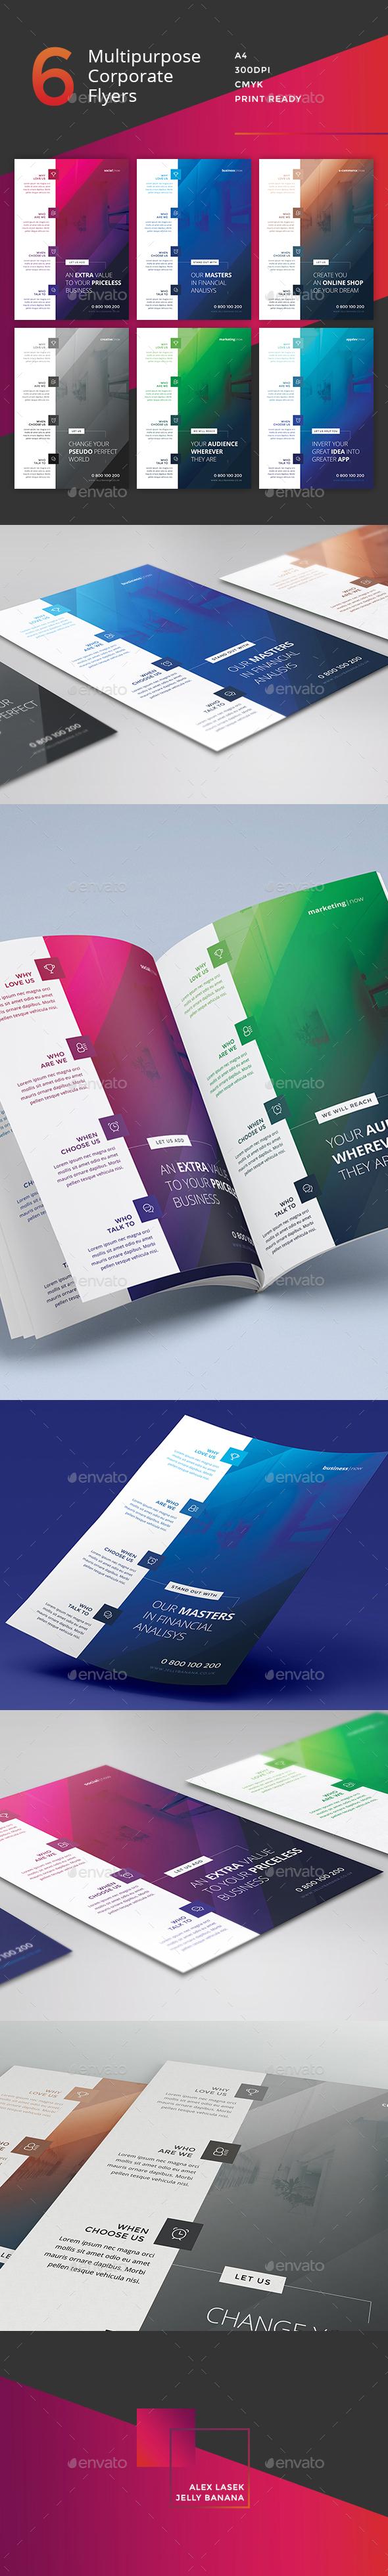 Corporate Flyer - 6 Multipurpose Business Templates vol 12 - Corporate Flyers